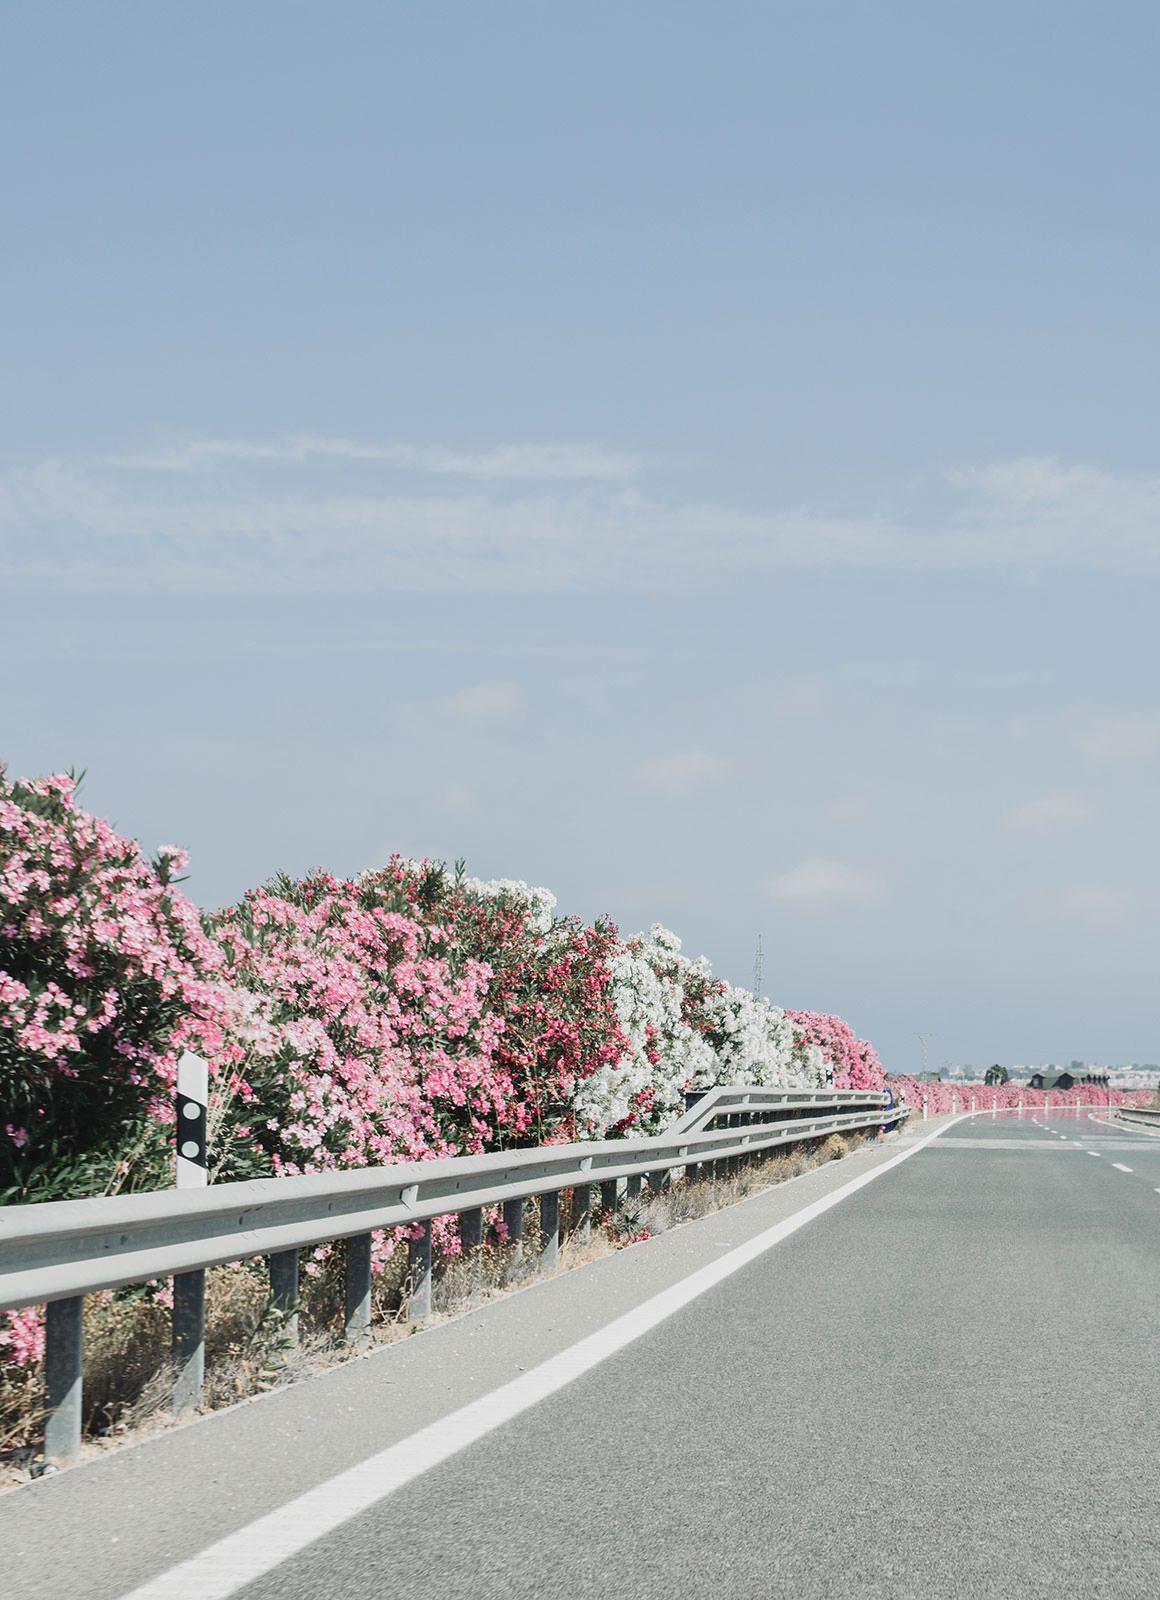 Barcelona to Madrid Road Trip